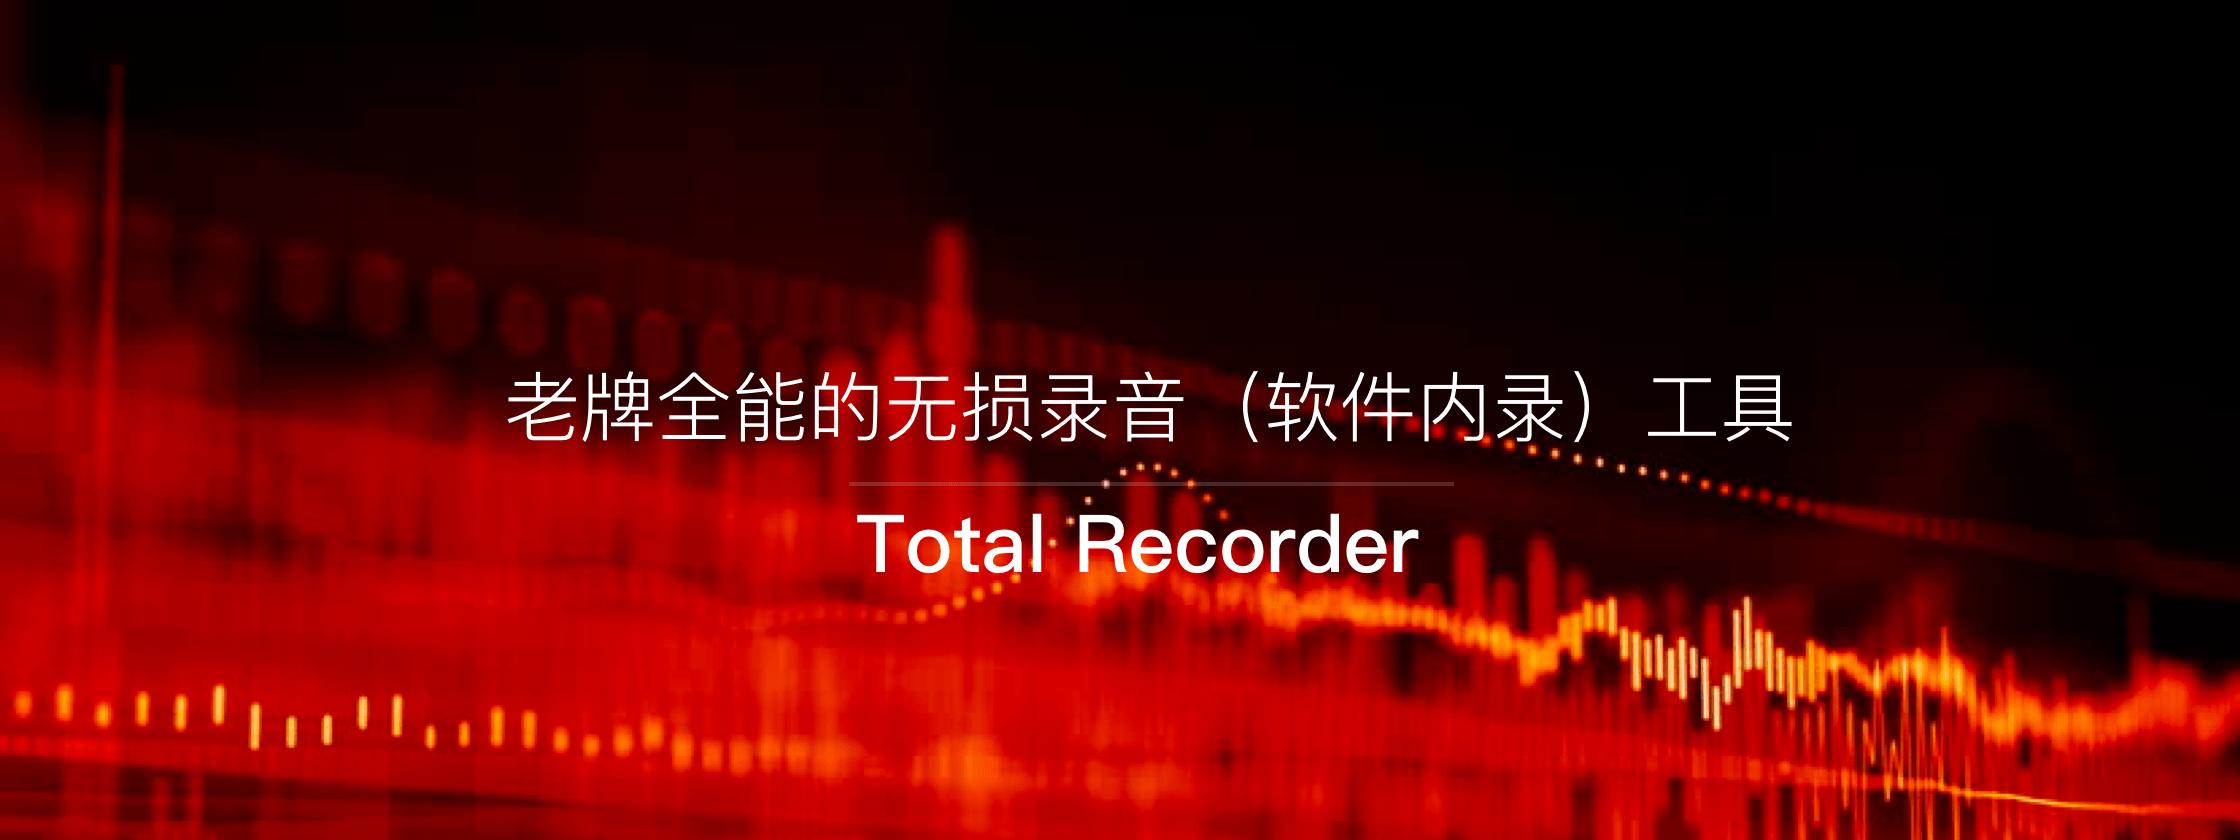 Total Recorder – 老牌全能的无损录音(软件内录)工具